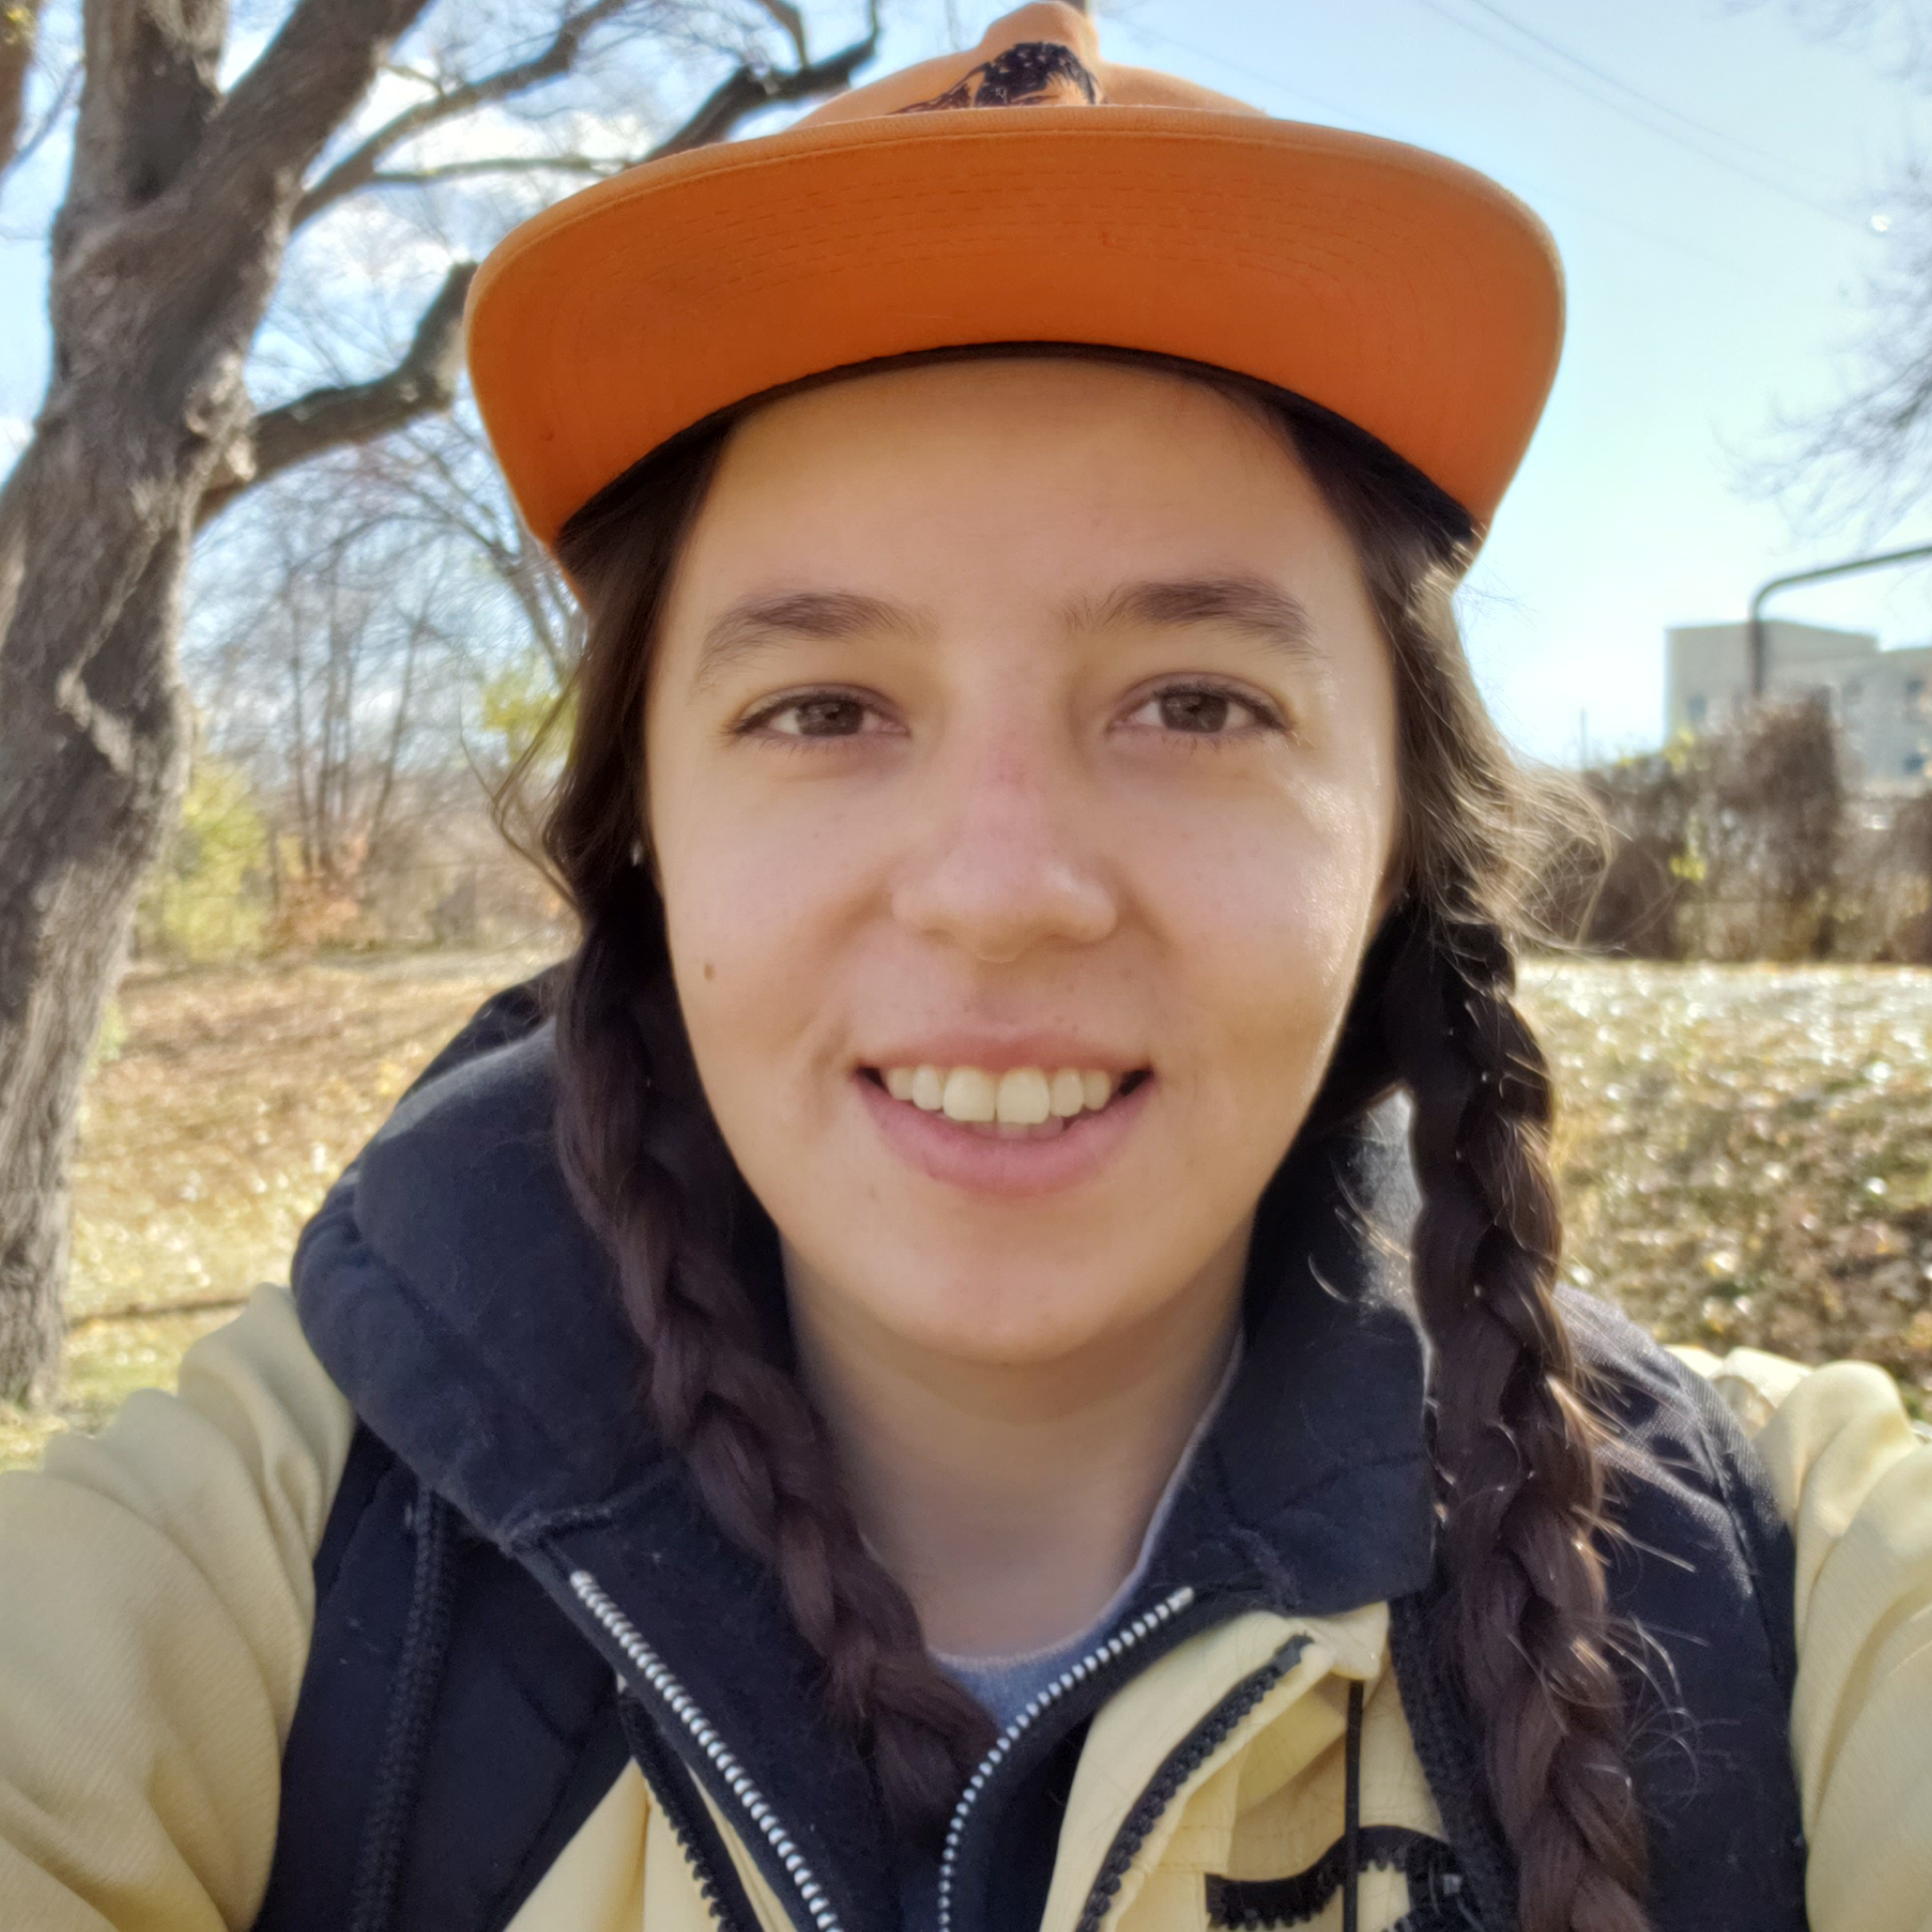 UWSA President for 2020-21 Shawna Peloquin